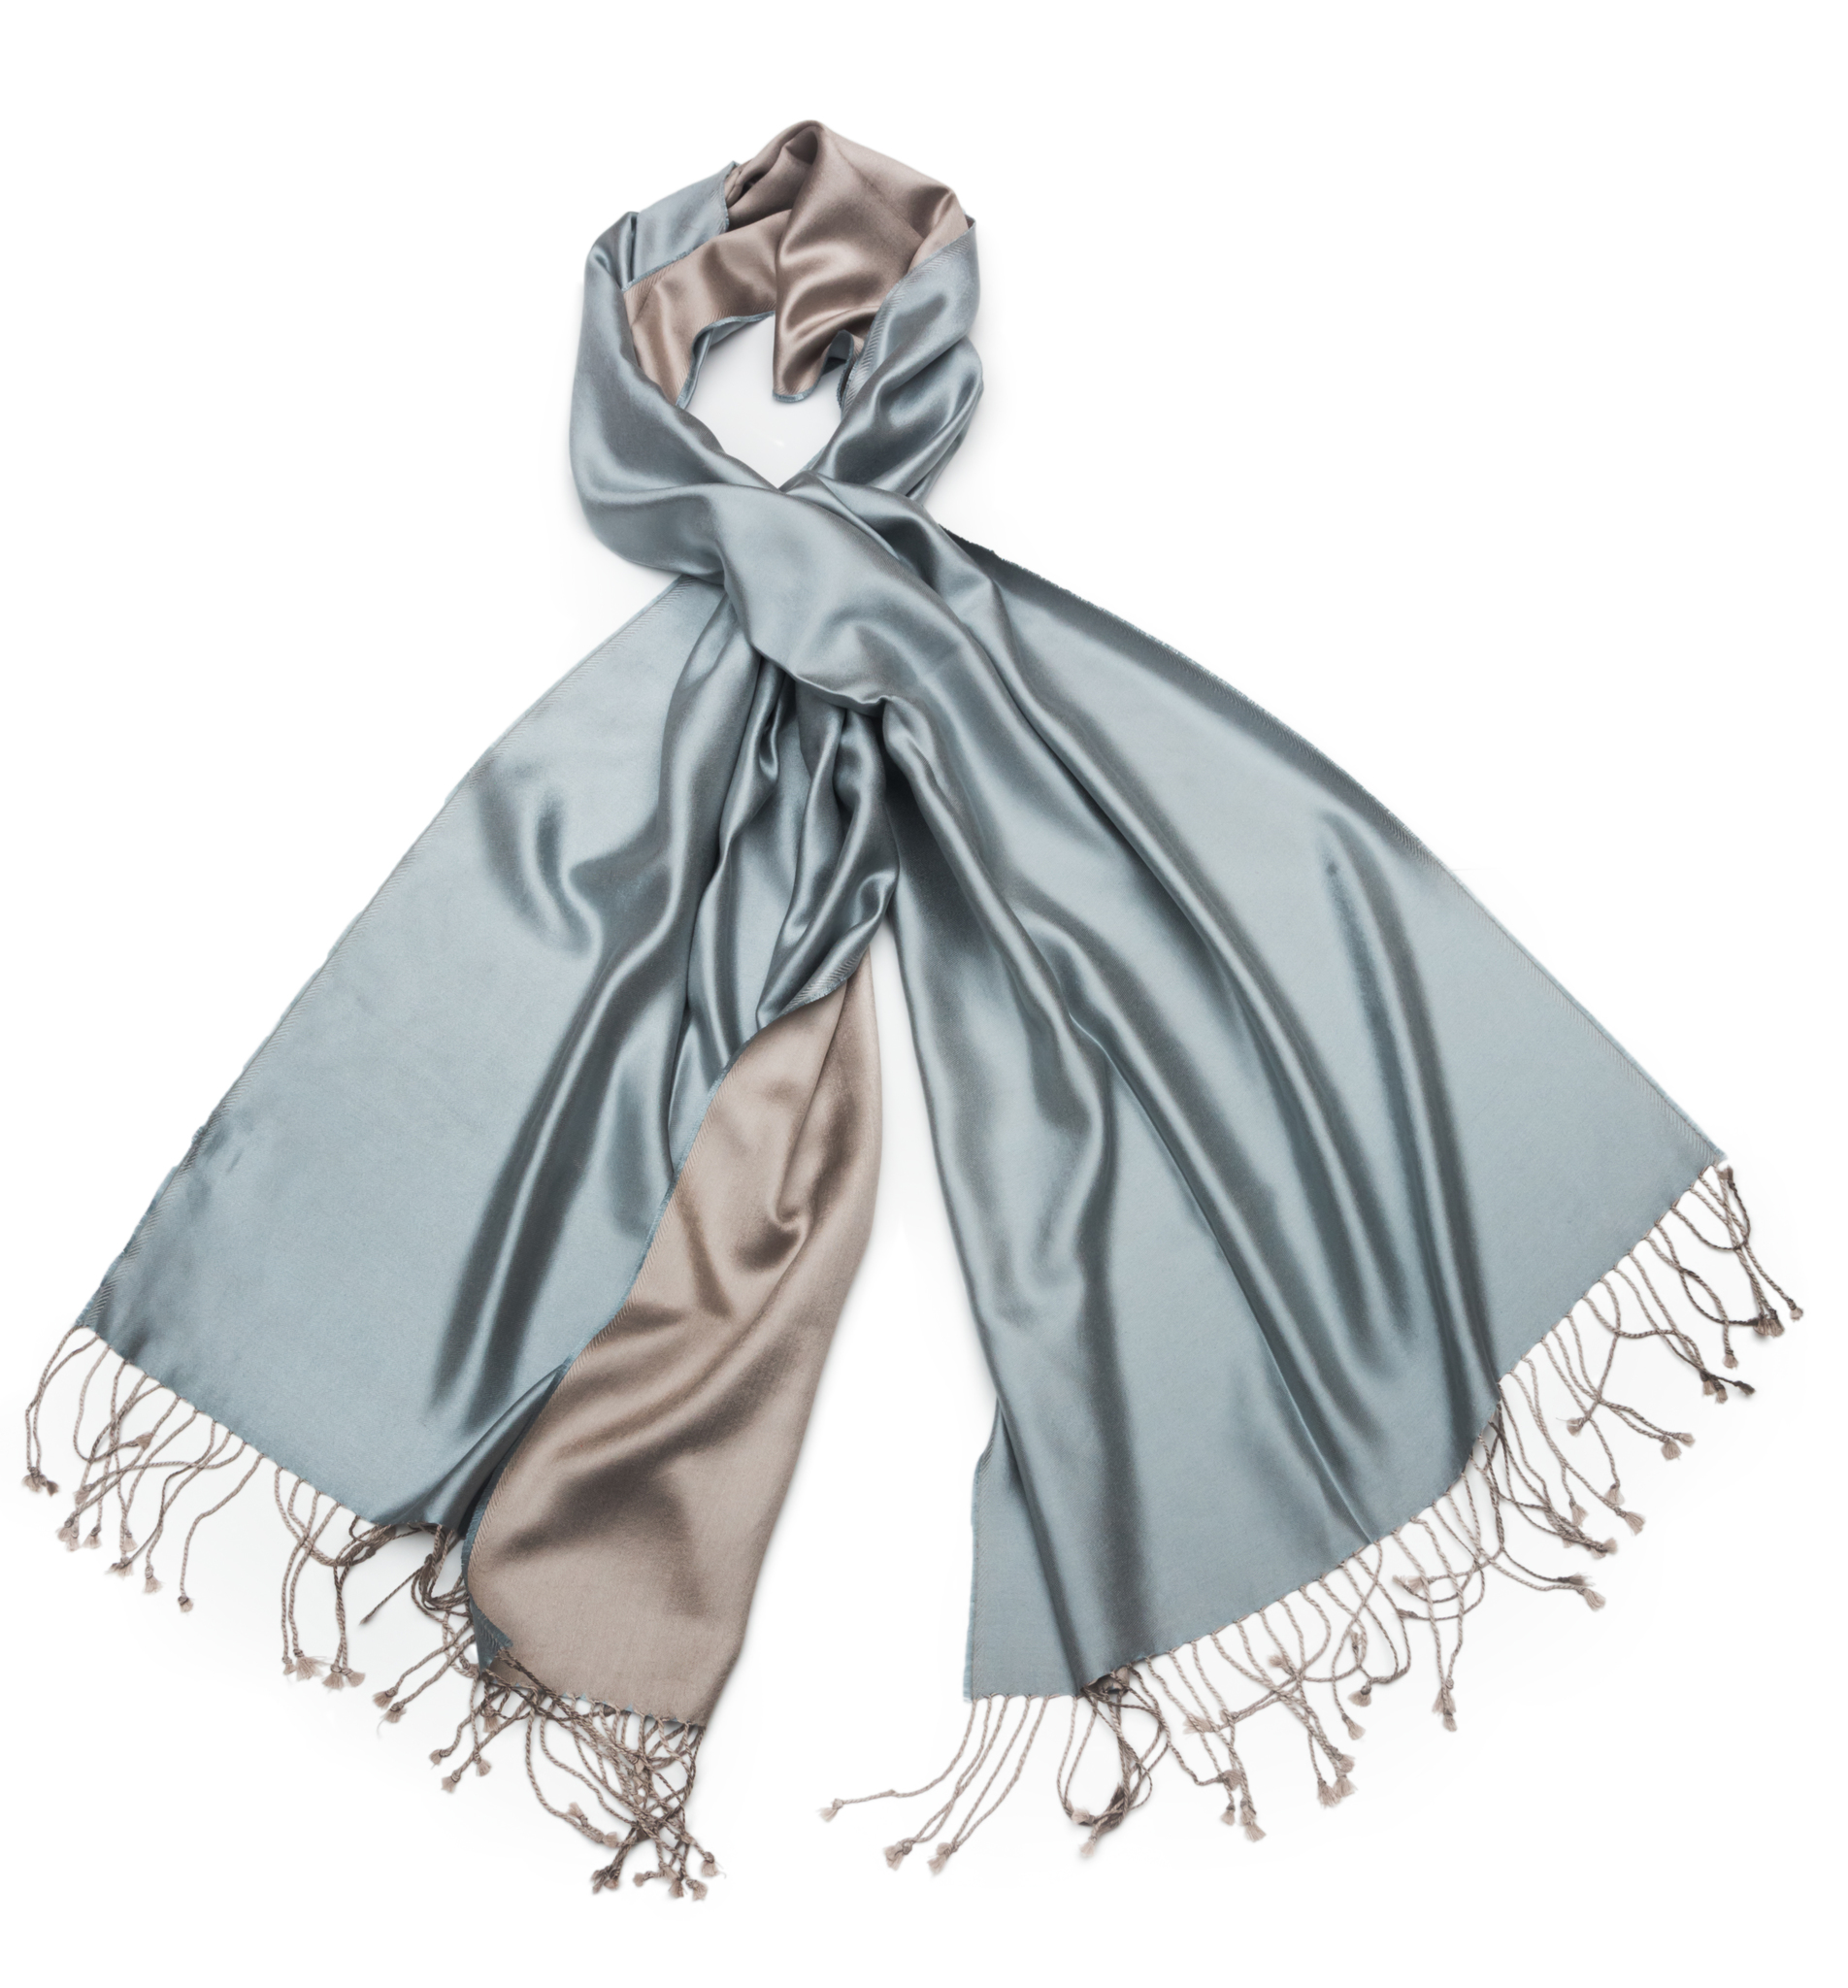 Одежда Шарф 50х180 AM Paris Parati25 серый sharf-50h180-am-paris-parati25-sero-goluboy-frantsiya.jpg